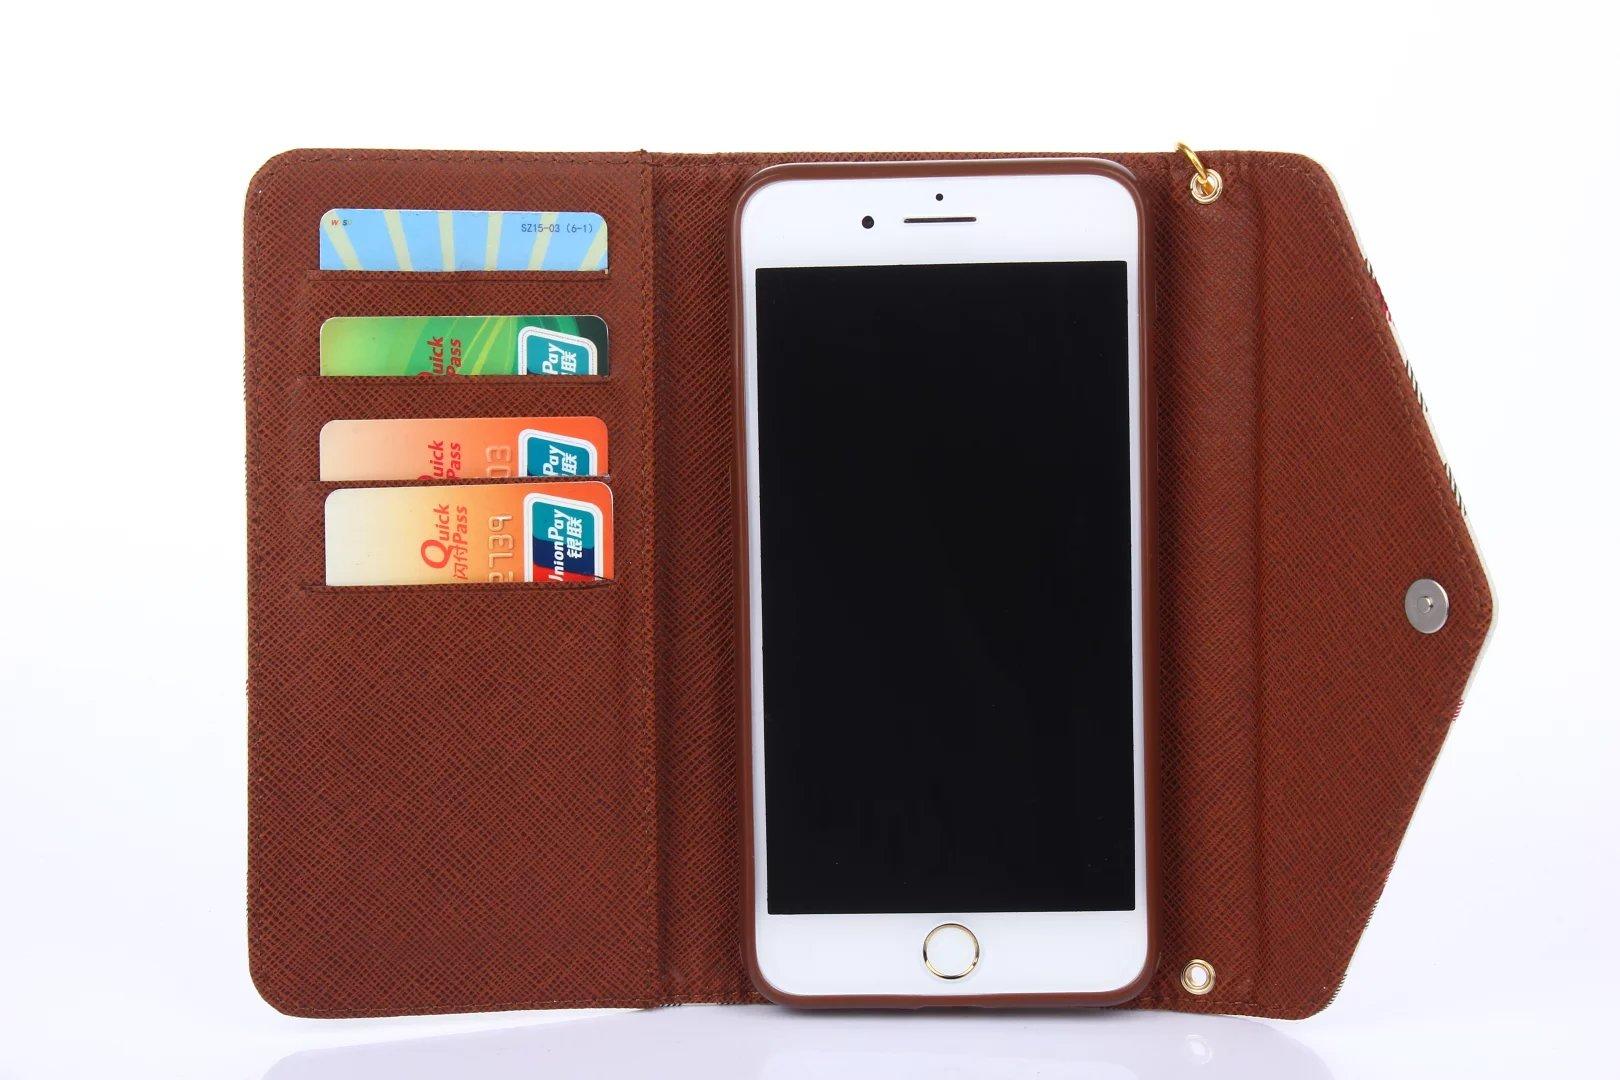 iphone 5s covers online designer case iphone 5s fashion iphone5s 5 SE case shop iphone 5 cases cover of iphone 5s best iphone cases 5s best cases for iphone 5s designer wallet men iphone 5s covers uk